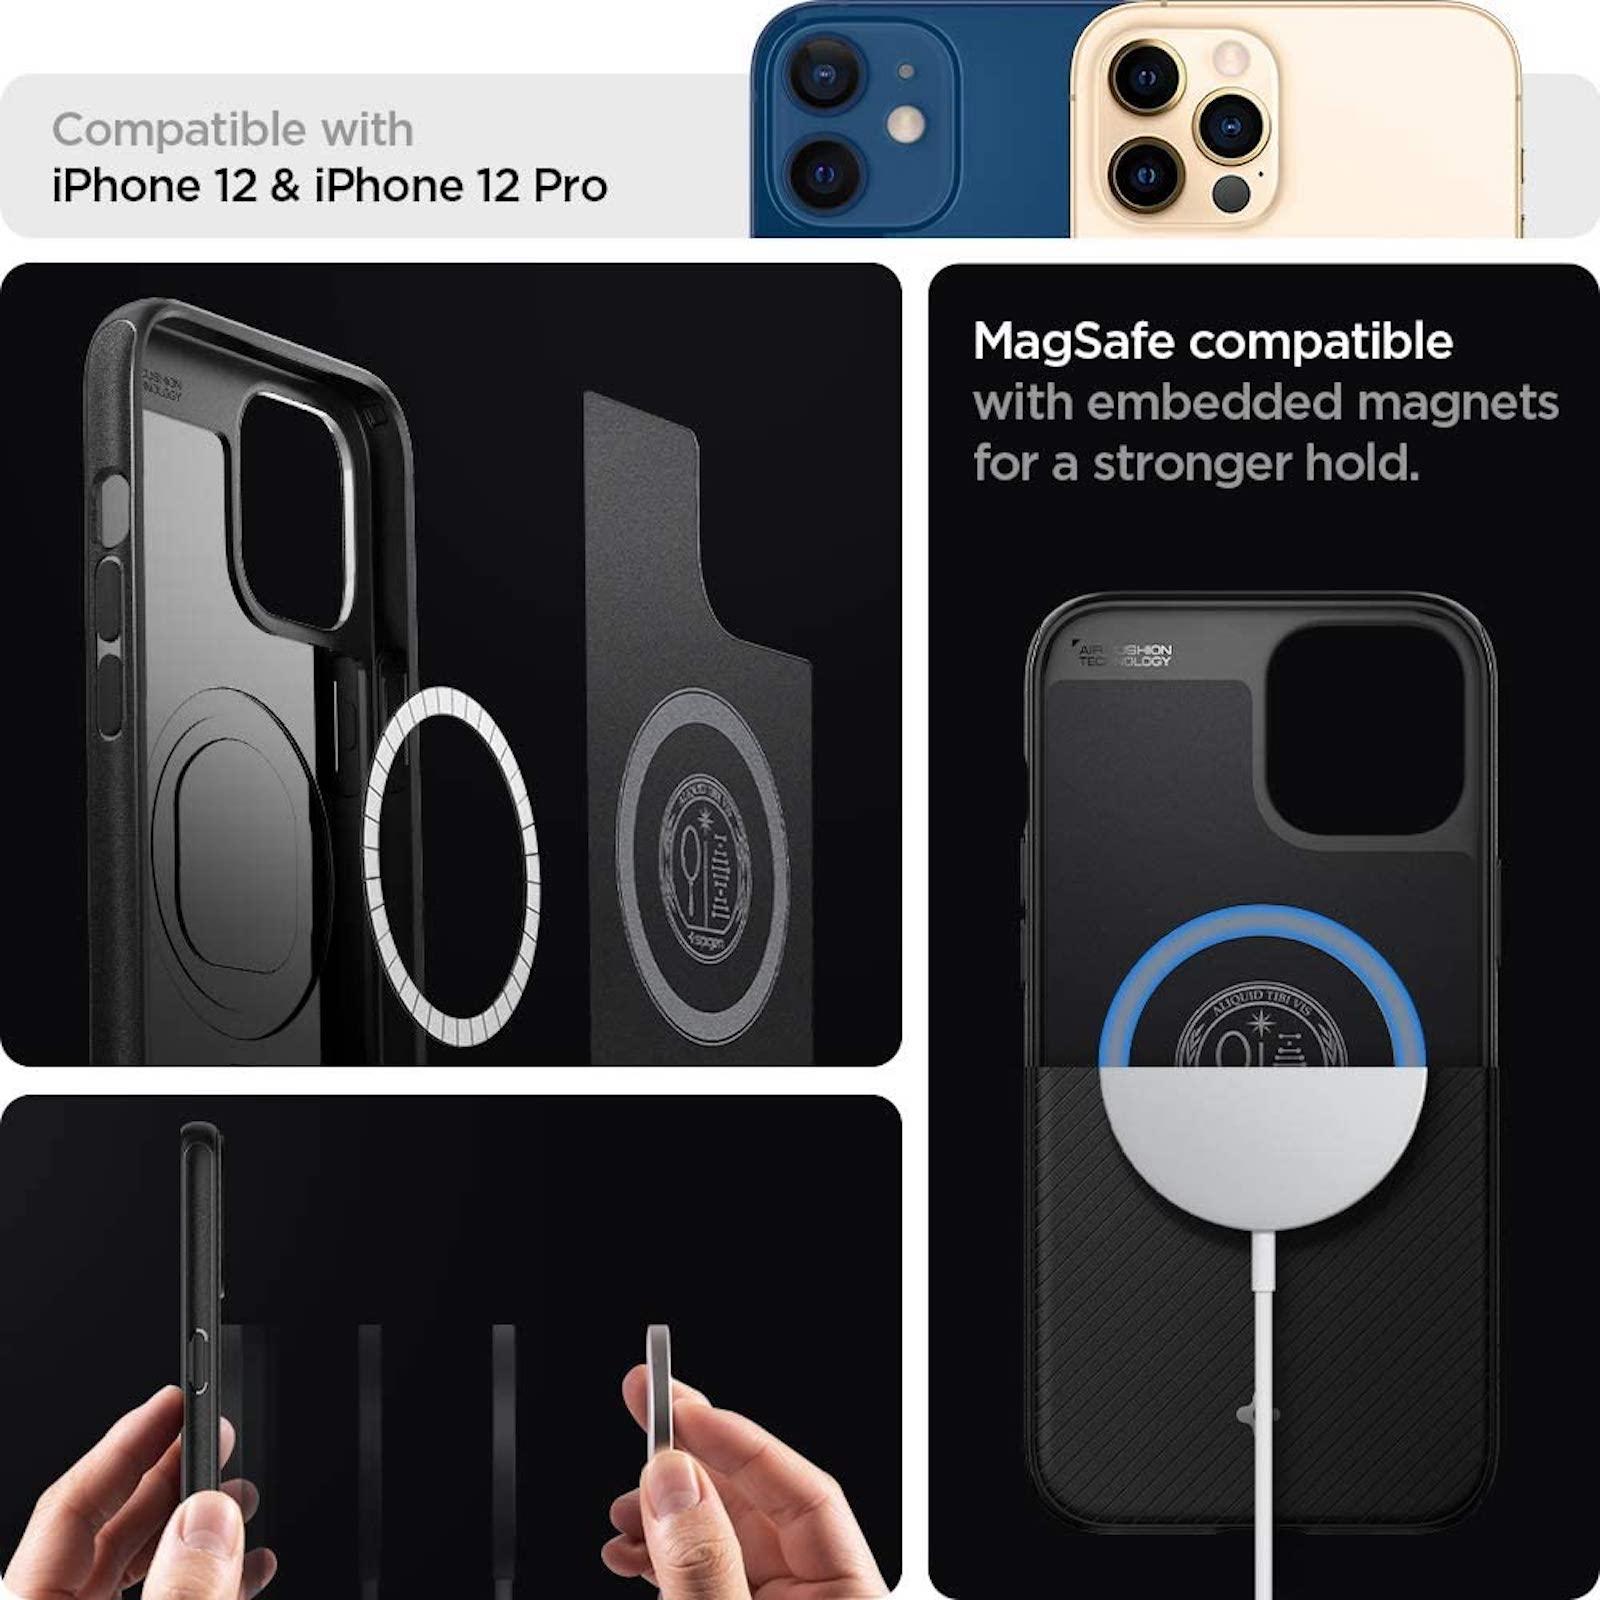 Iphone12pro magsafe